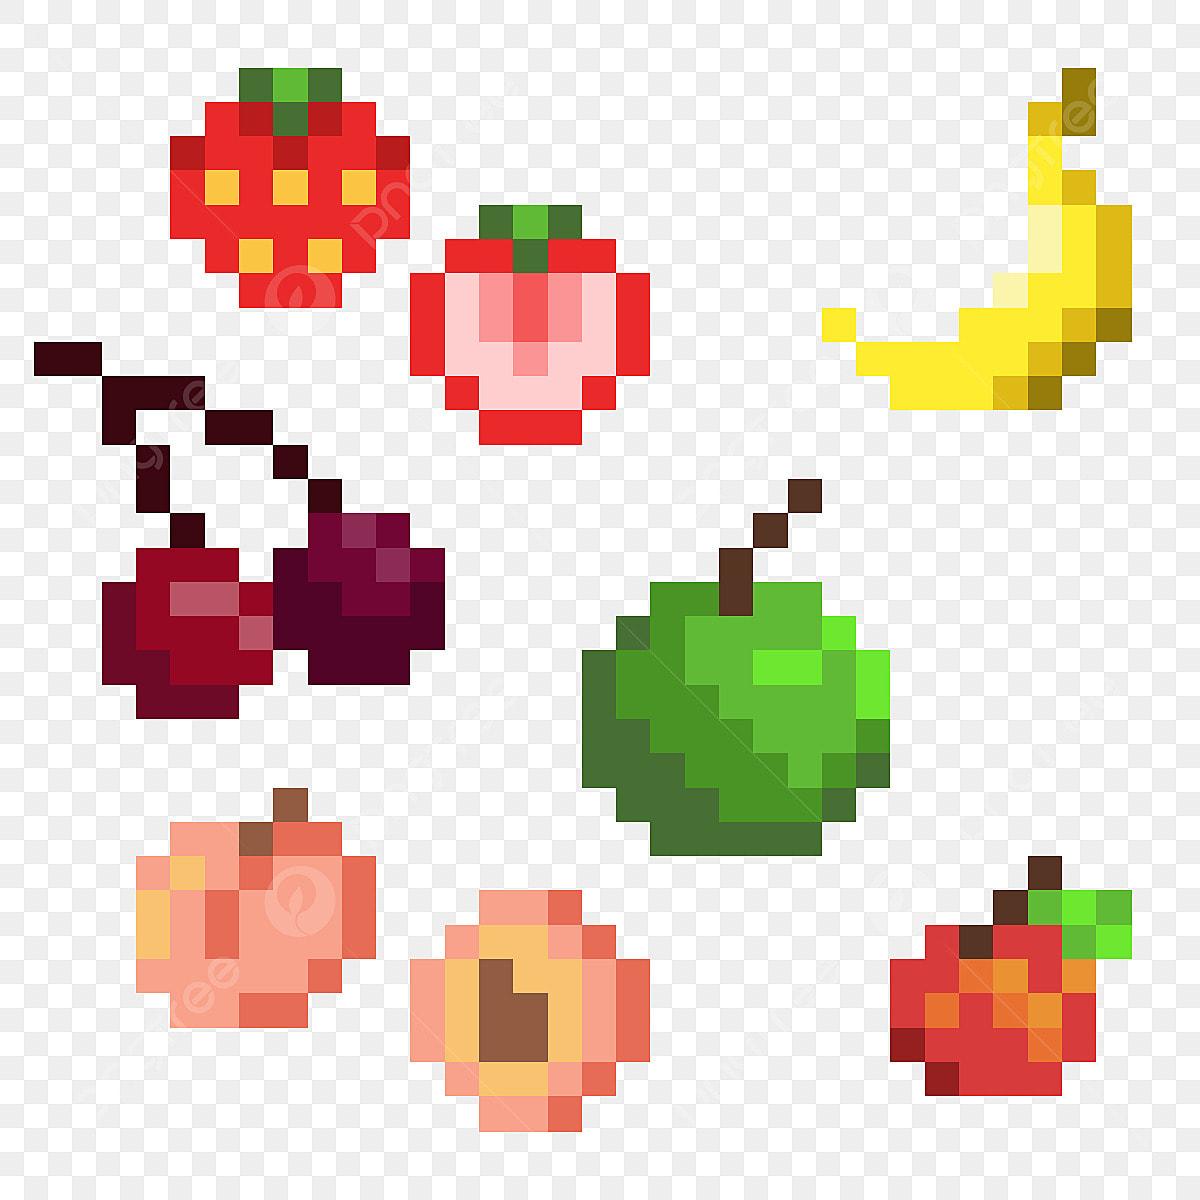 Pixel Fruit Pack Pixel Art Fruit Cherry Png Transparent